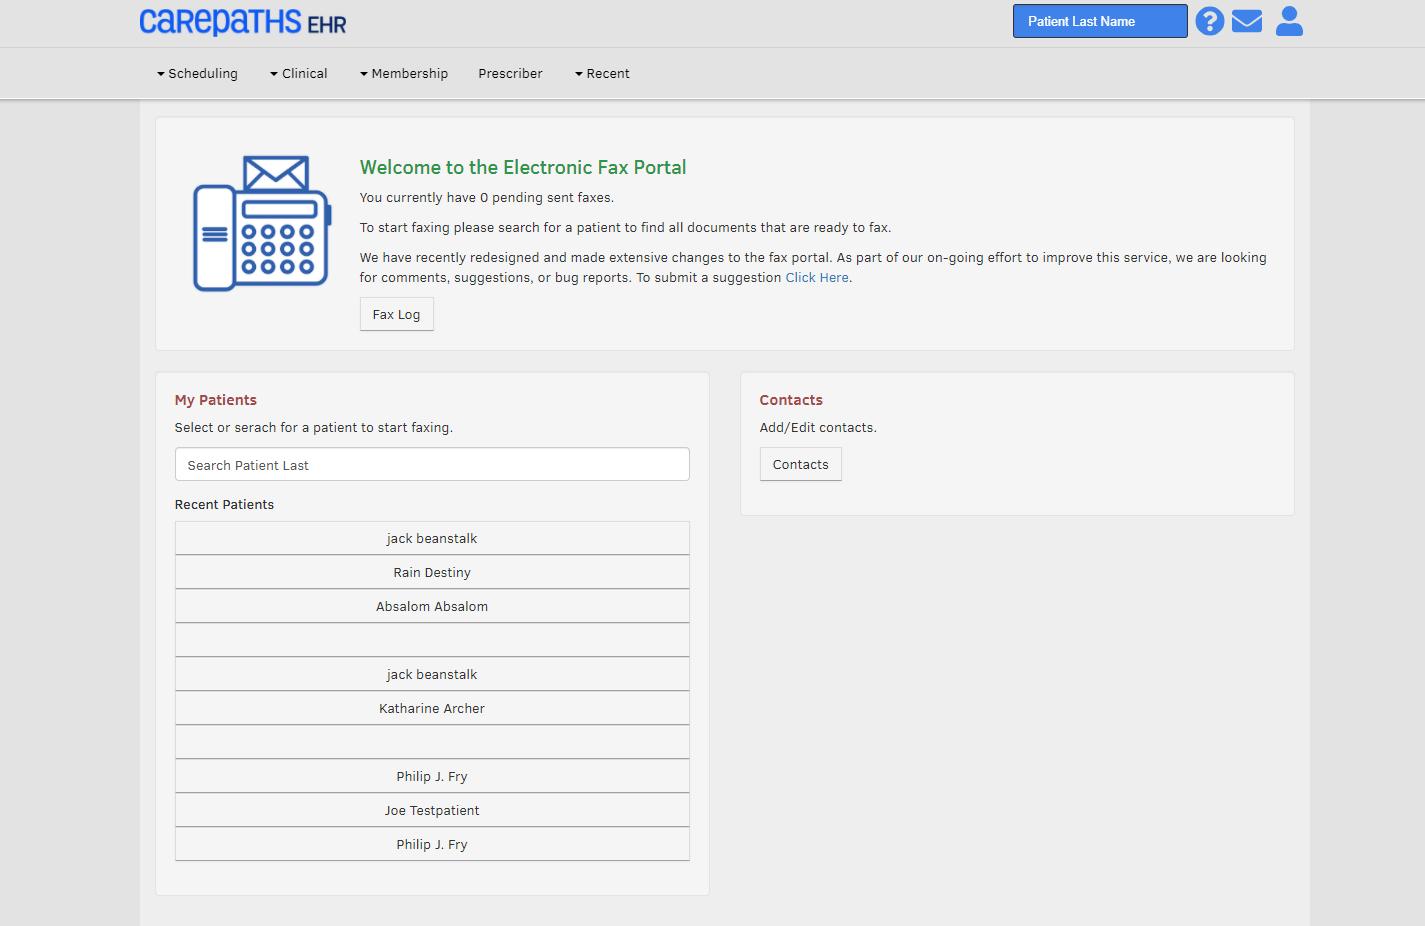 CarePaths EHR Software - eFax Portal